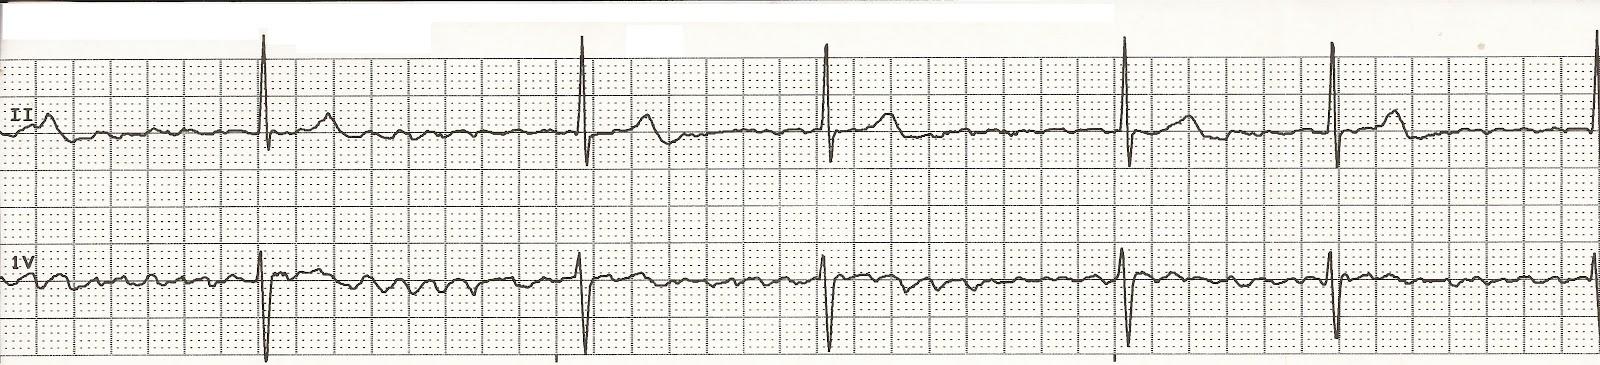 cvml_0080a_Atrial_Fibrillation_1920x1080 (00000)